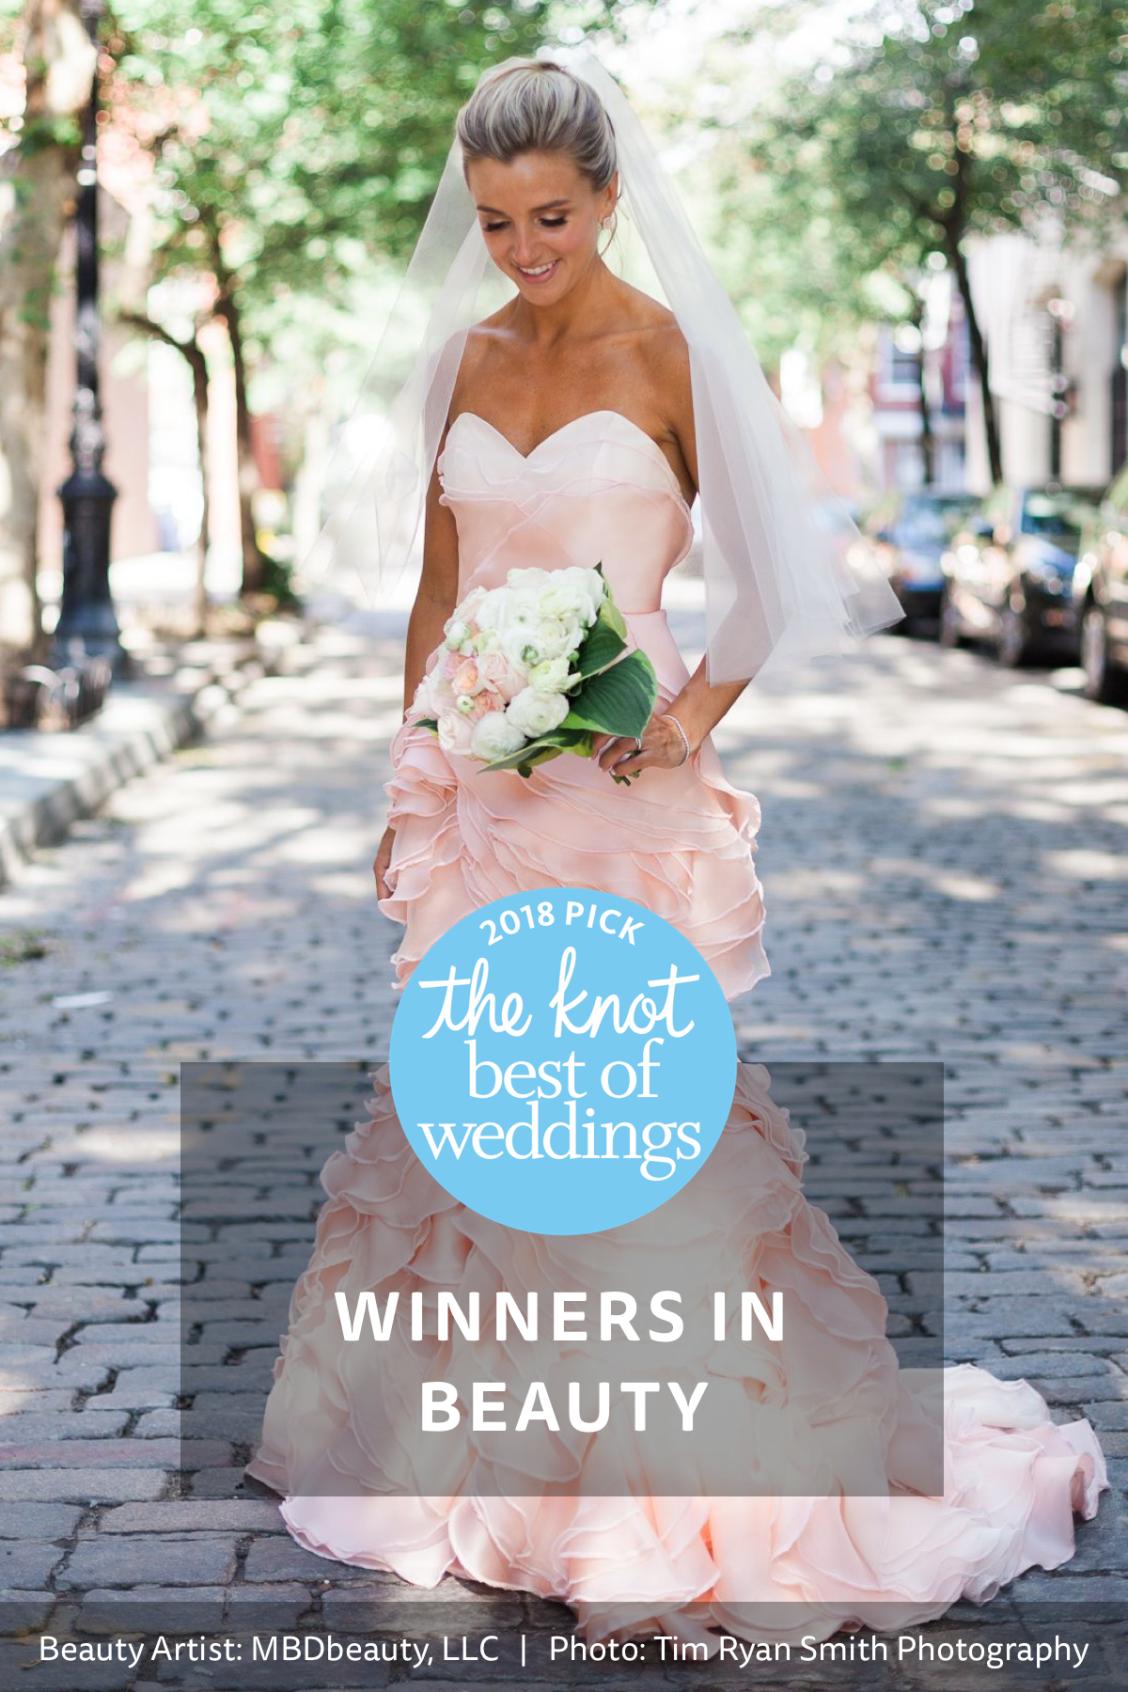 beauty salons in ashburn, va - the knot | wedding beauty